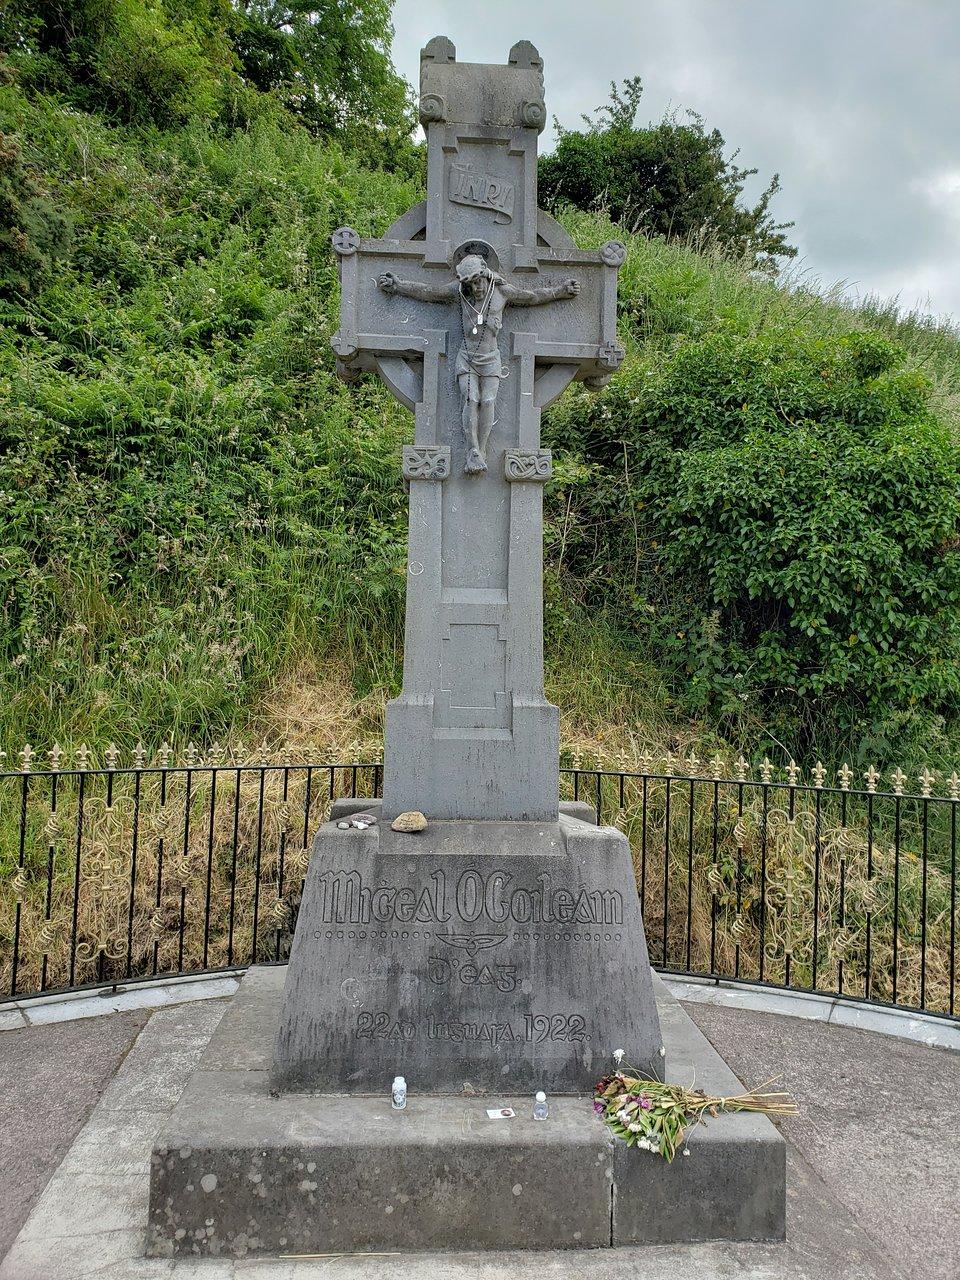 Walking where ghosts tread - The Irish Times